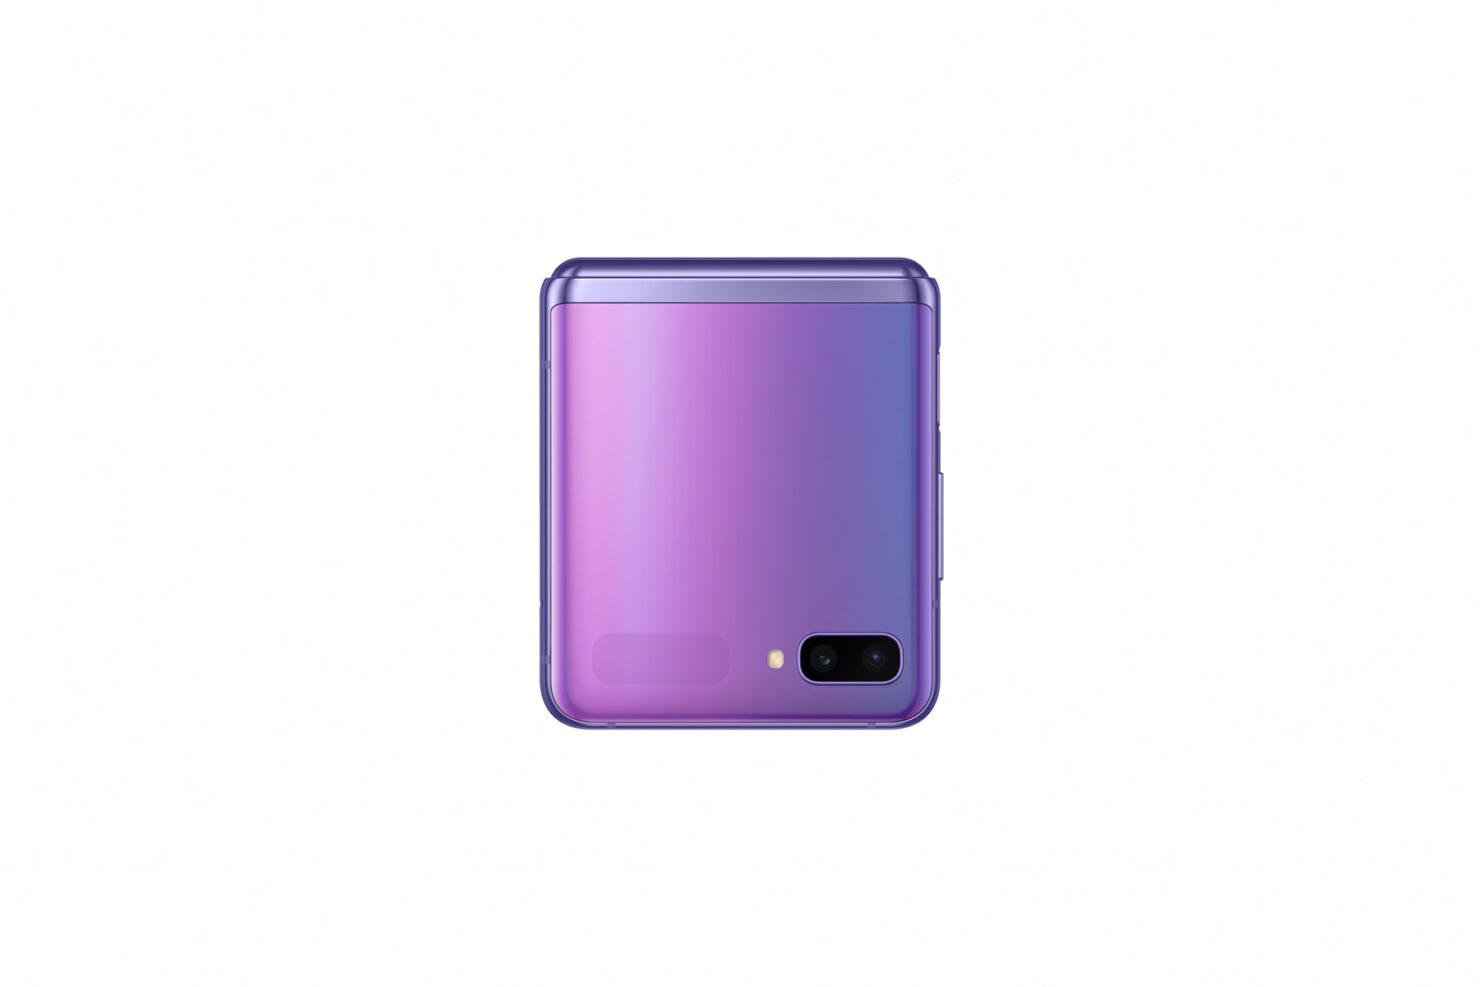 002_galaxyzflip_mirror_purple_folded_front